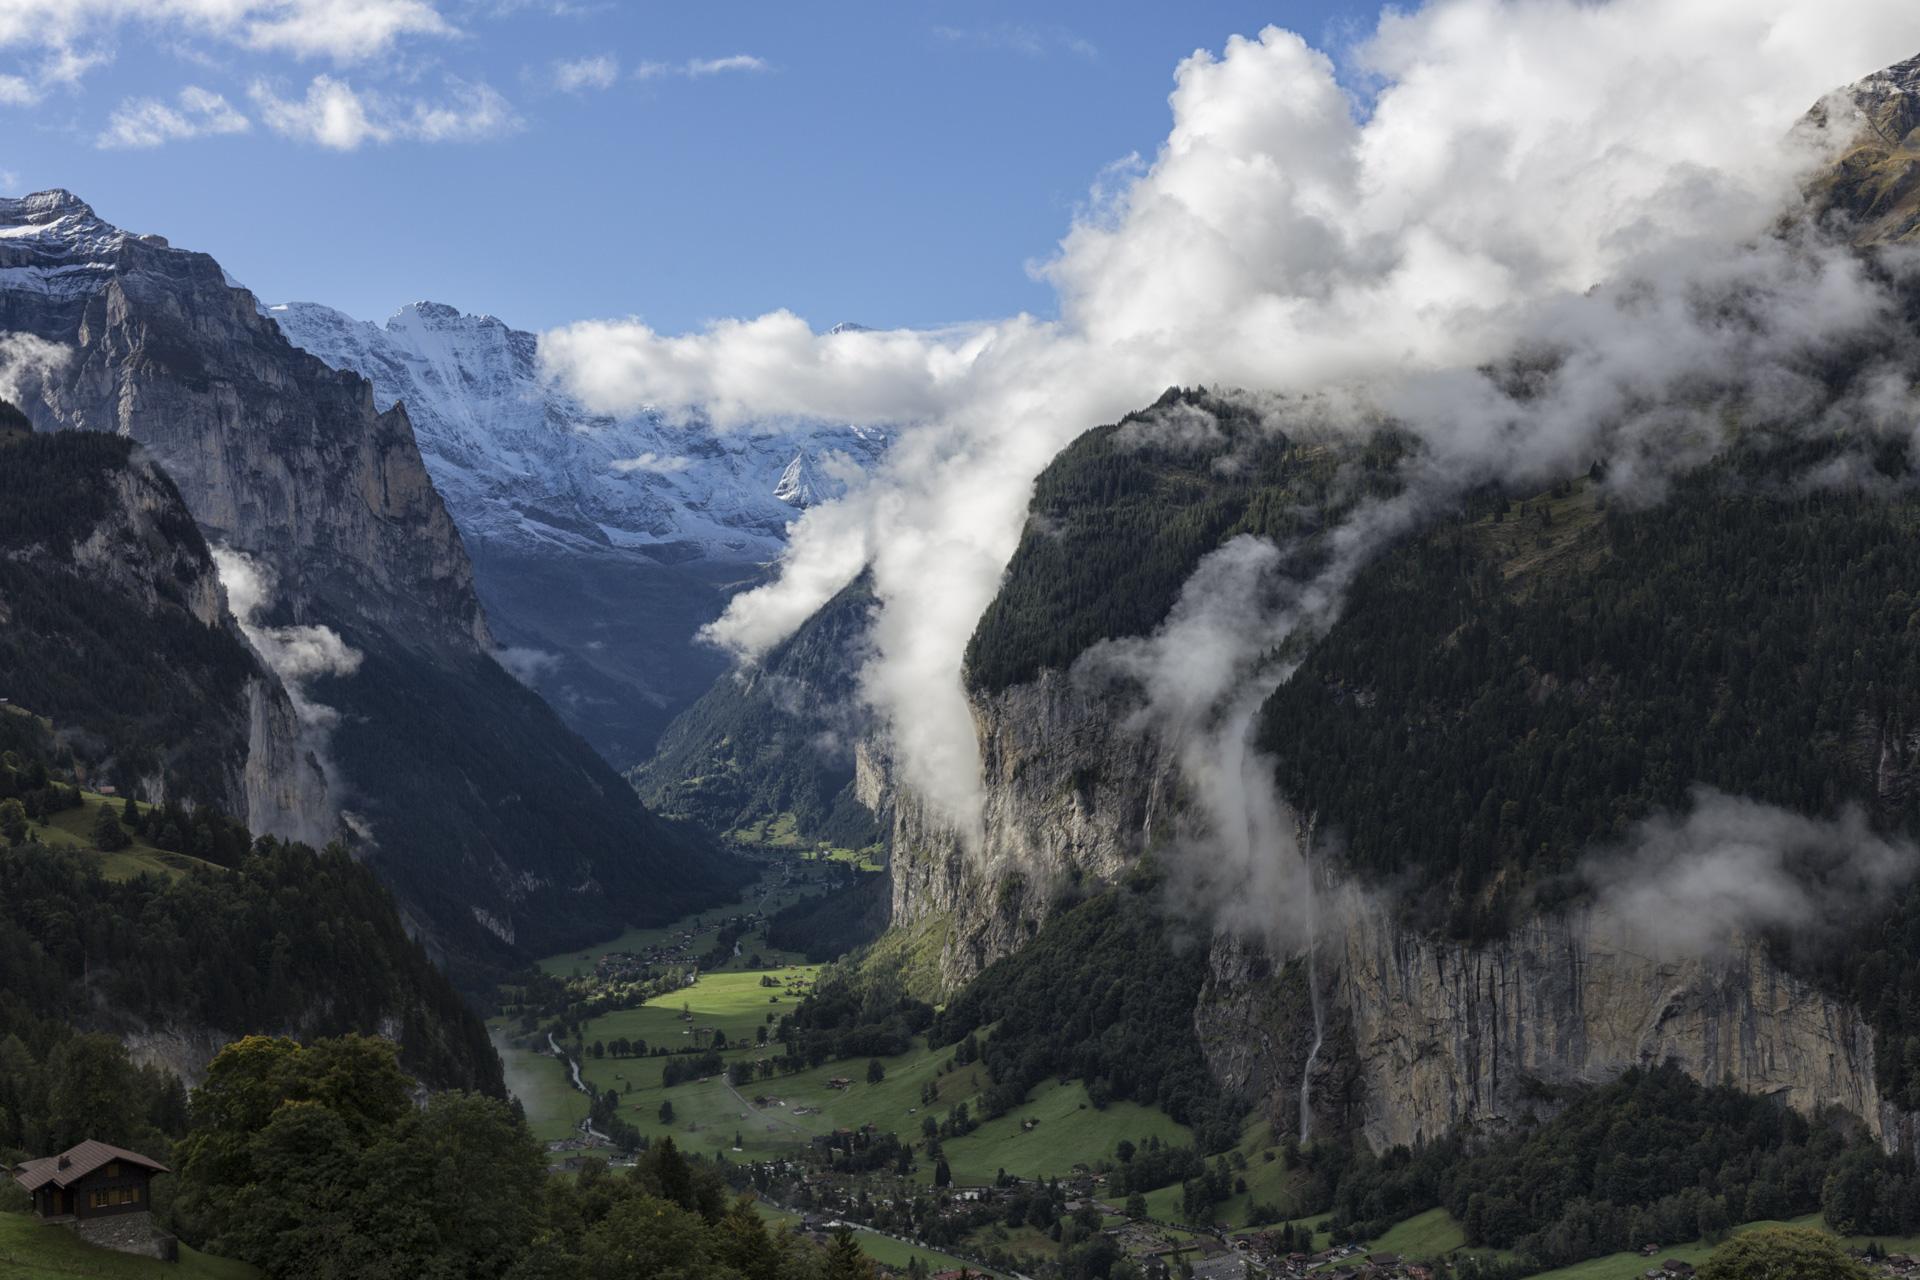 Berner-Oberland_20150920_2141-2